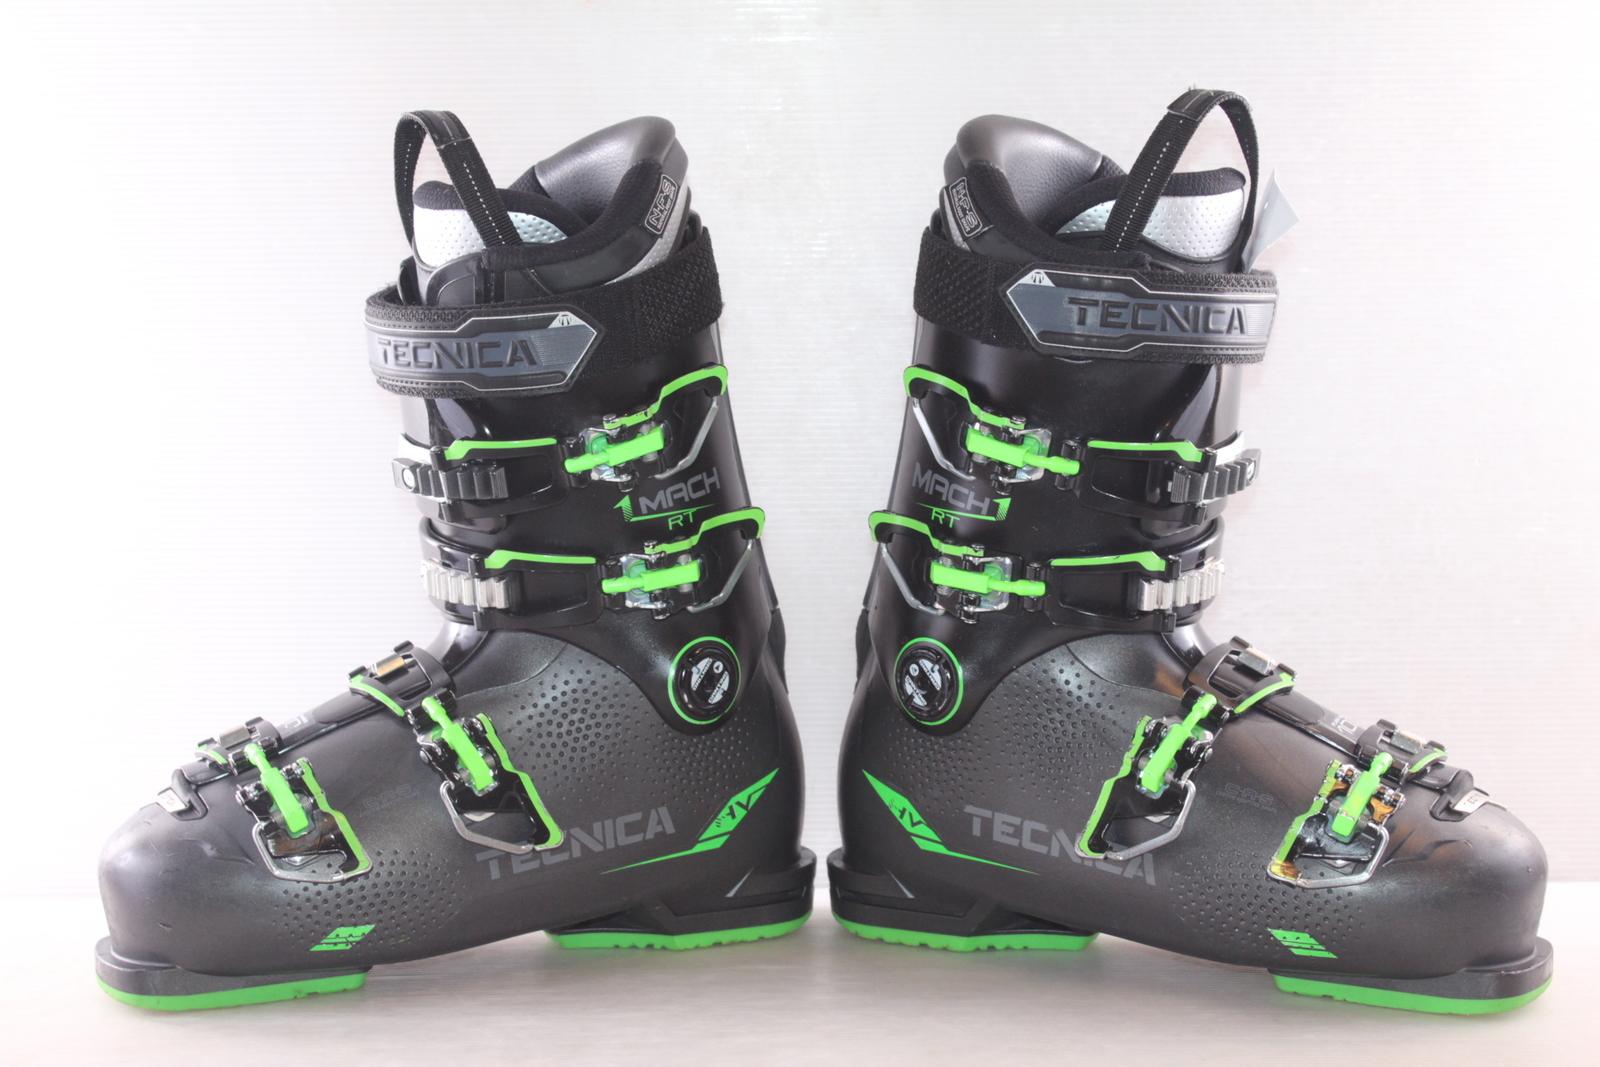 Lyžařské boty Tecnica Mach 1 RT vel. EU42 flexe 100